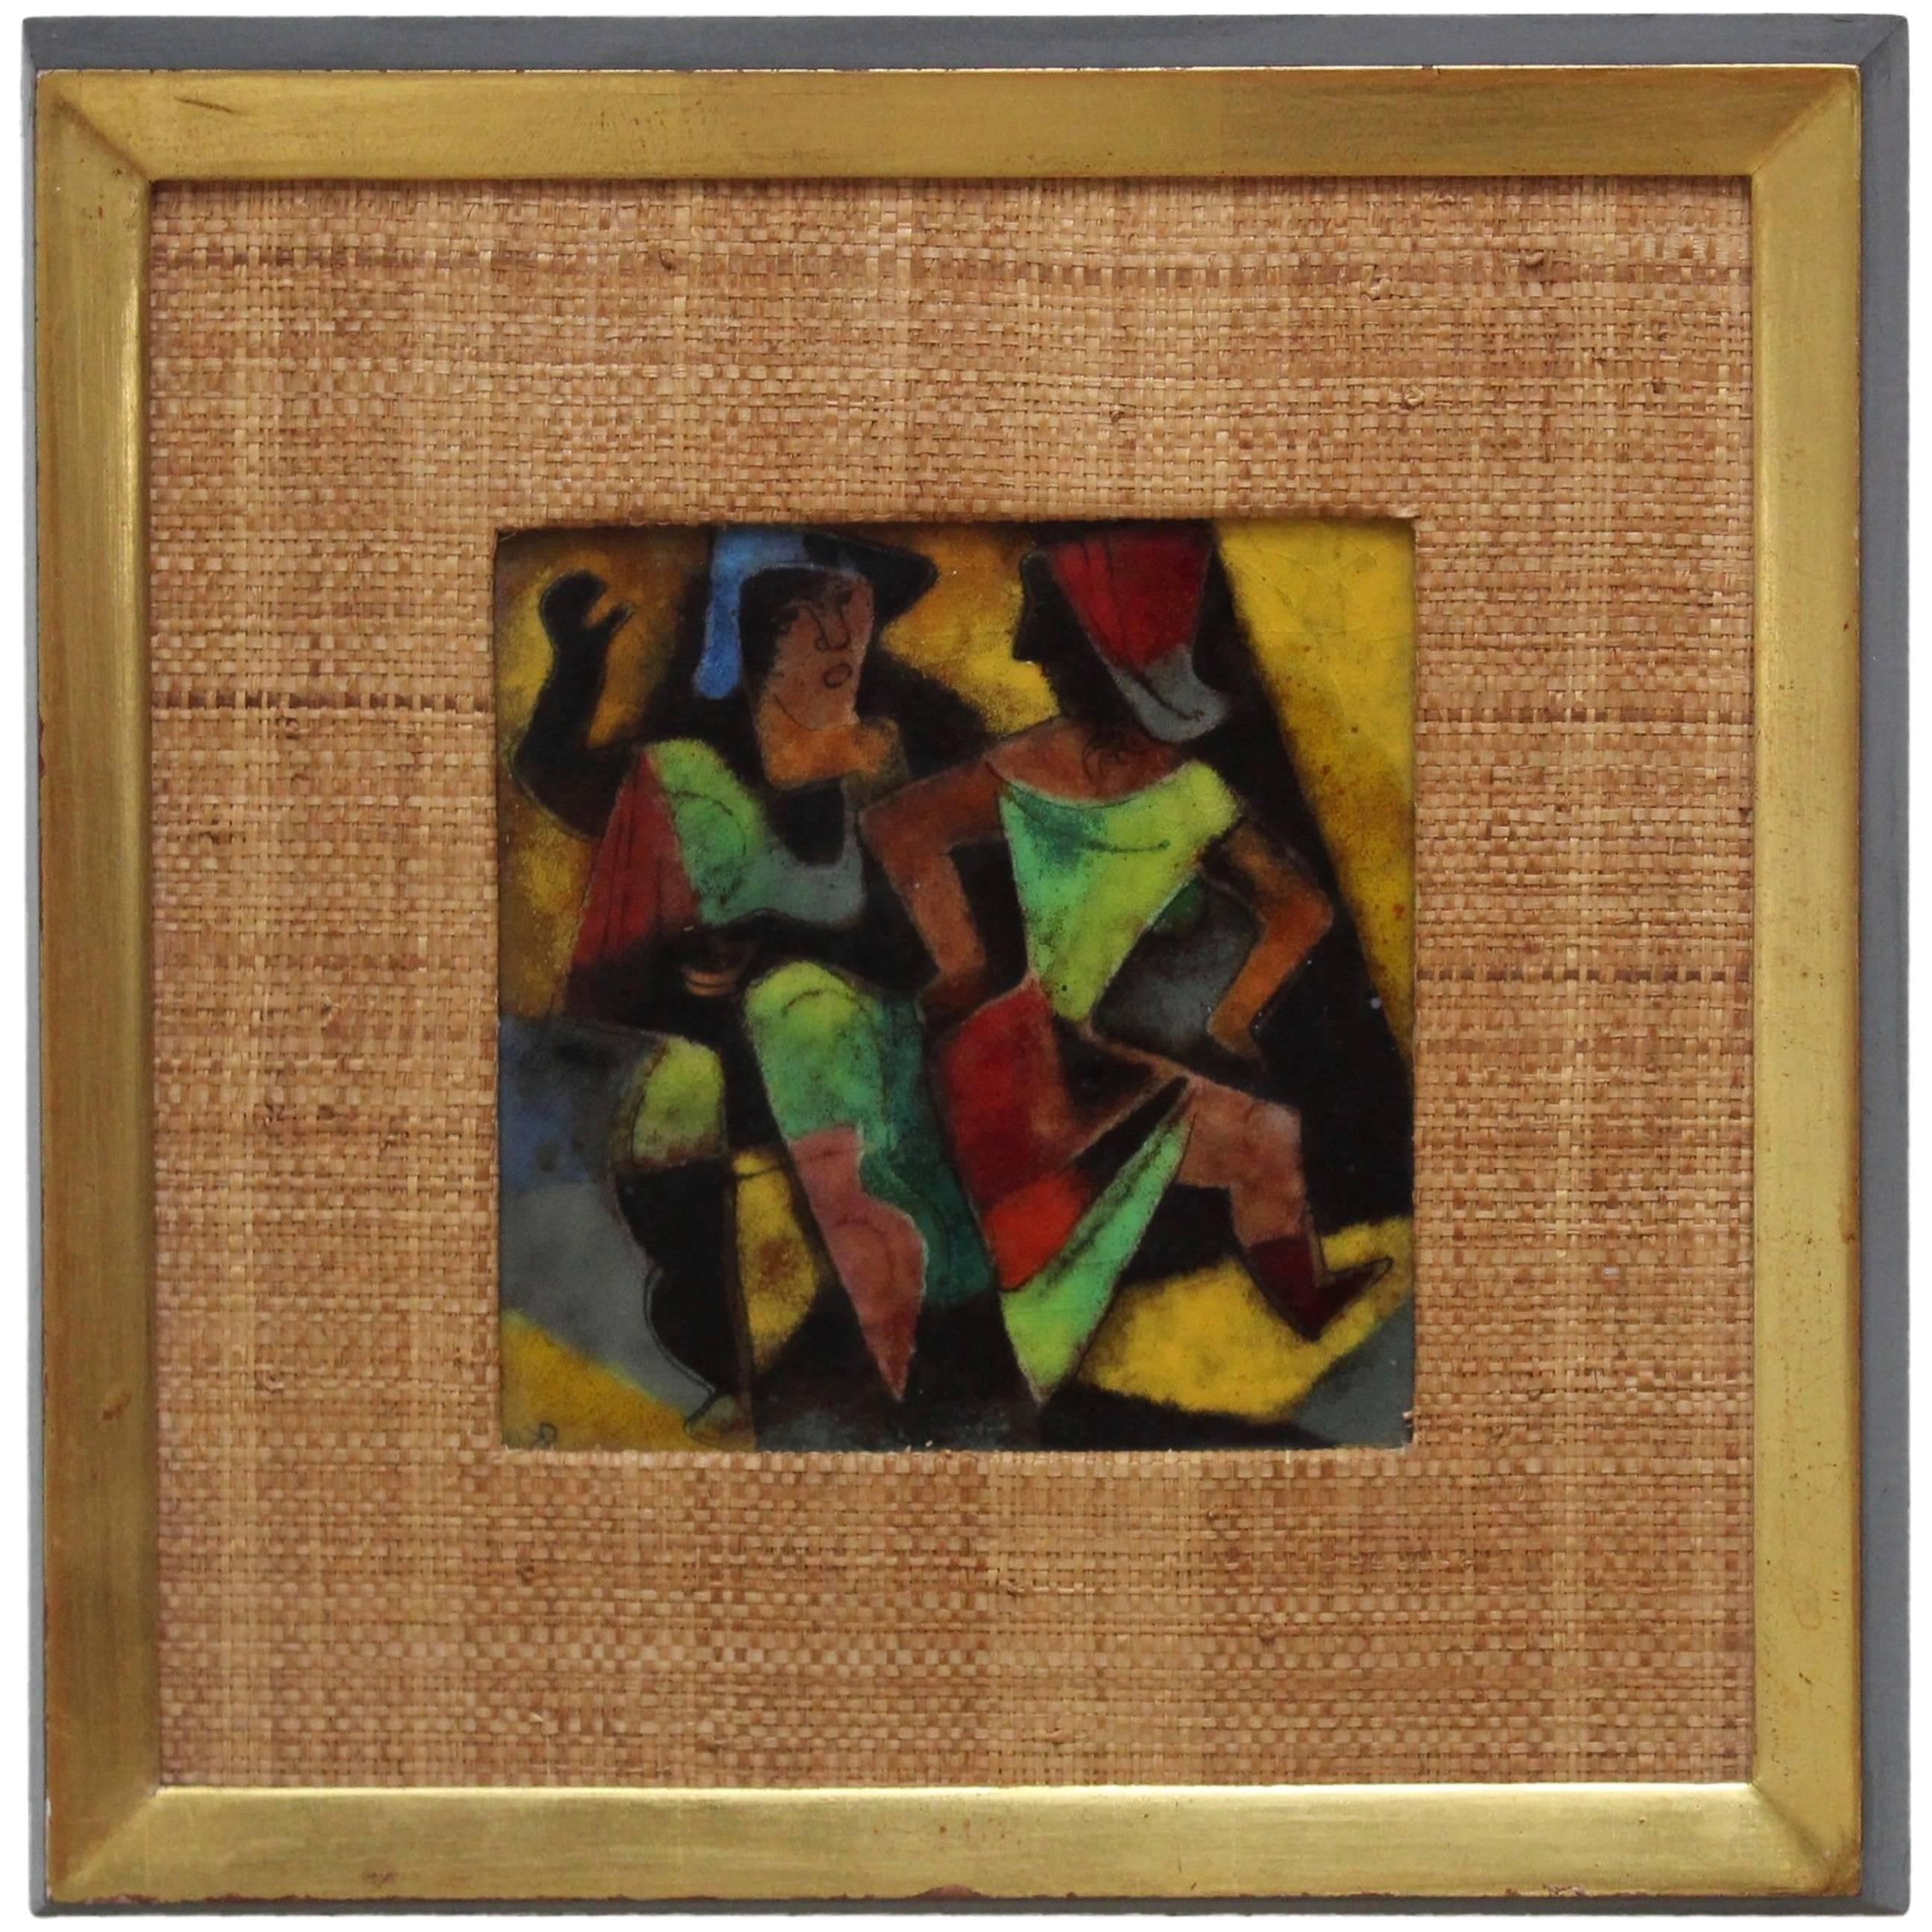 1950s Karl Drerup Enamel on Copper Frame Artwork